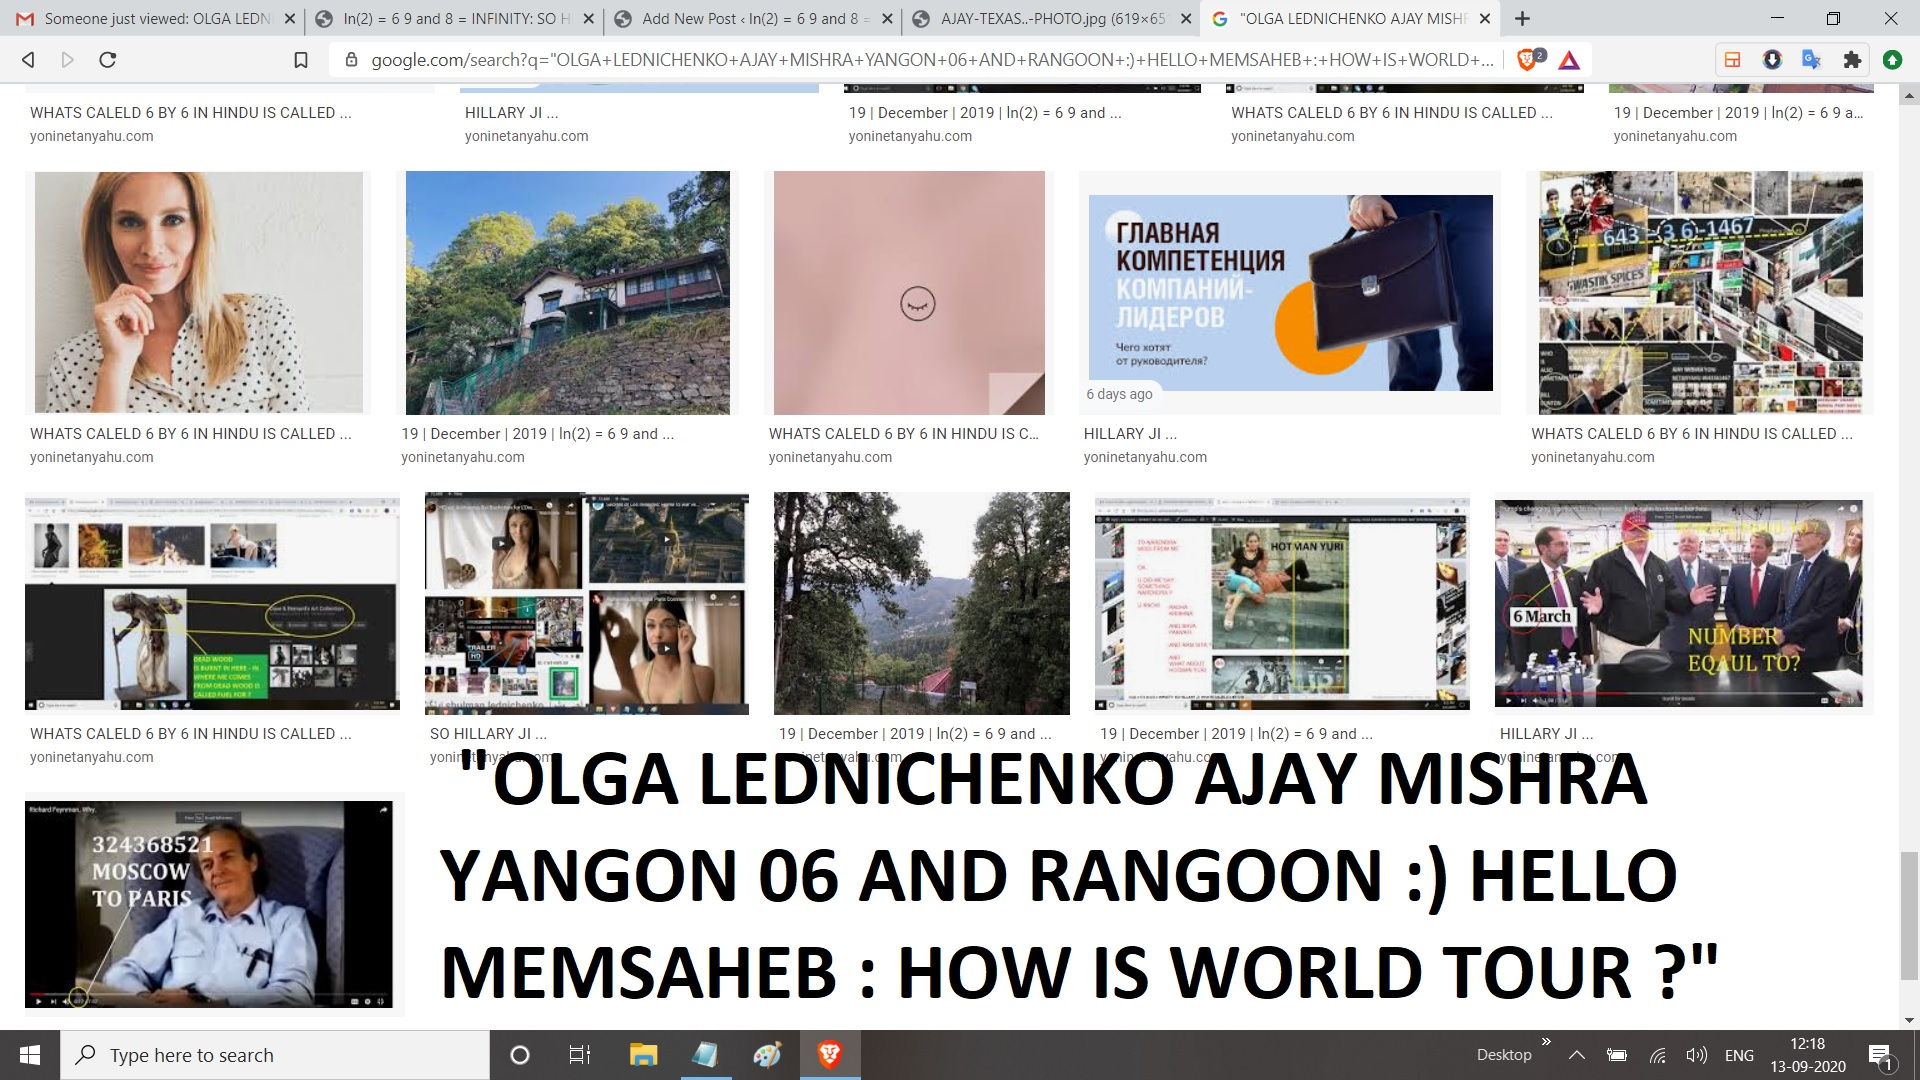 OLGA LEDNICHENKO AJAY MISHRA YANGON 06 AND RANGOON HELLO MEMSAHEB HOW IS WORLD TOUR